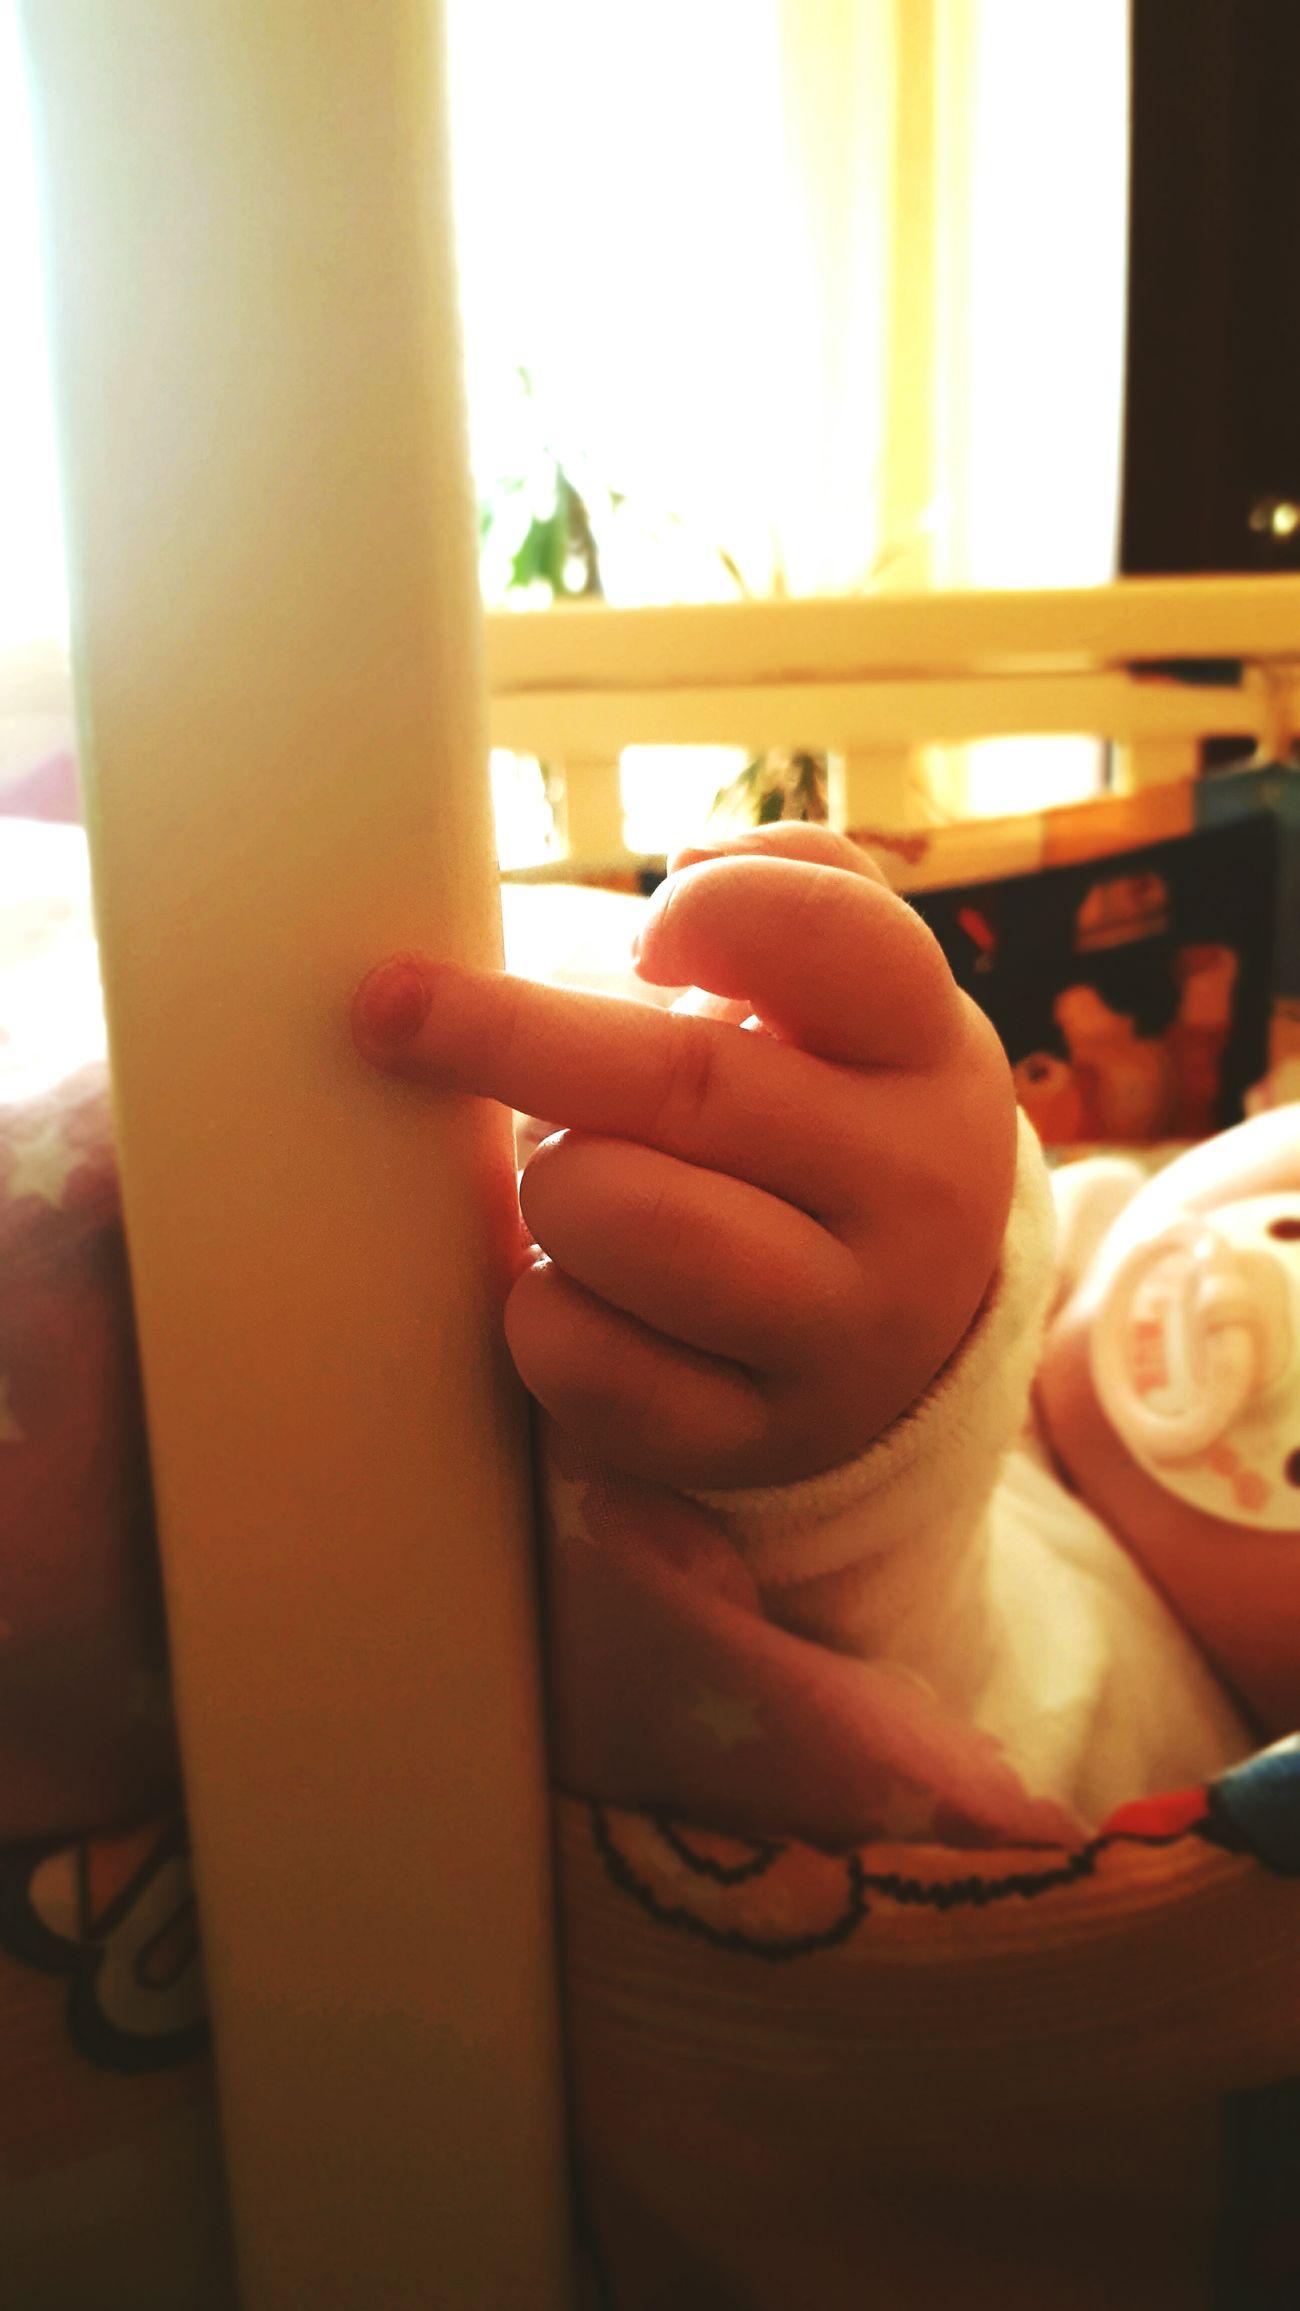 Я ей доча спи а он вот ♡♡♡♡♡